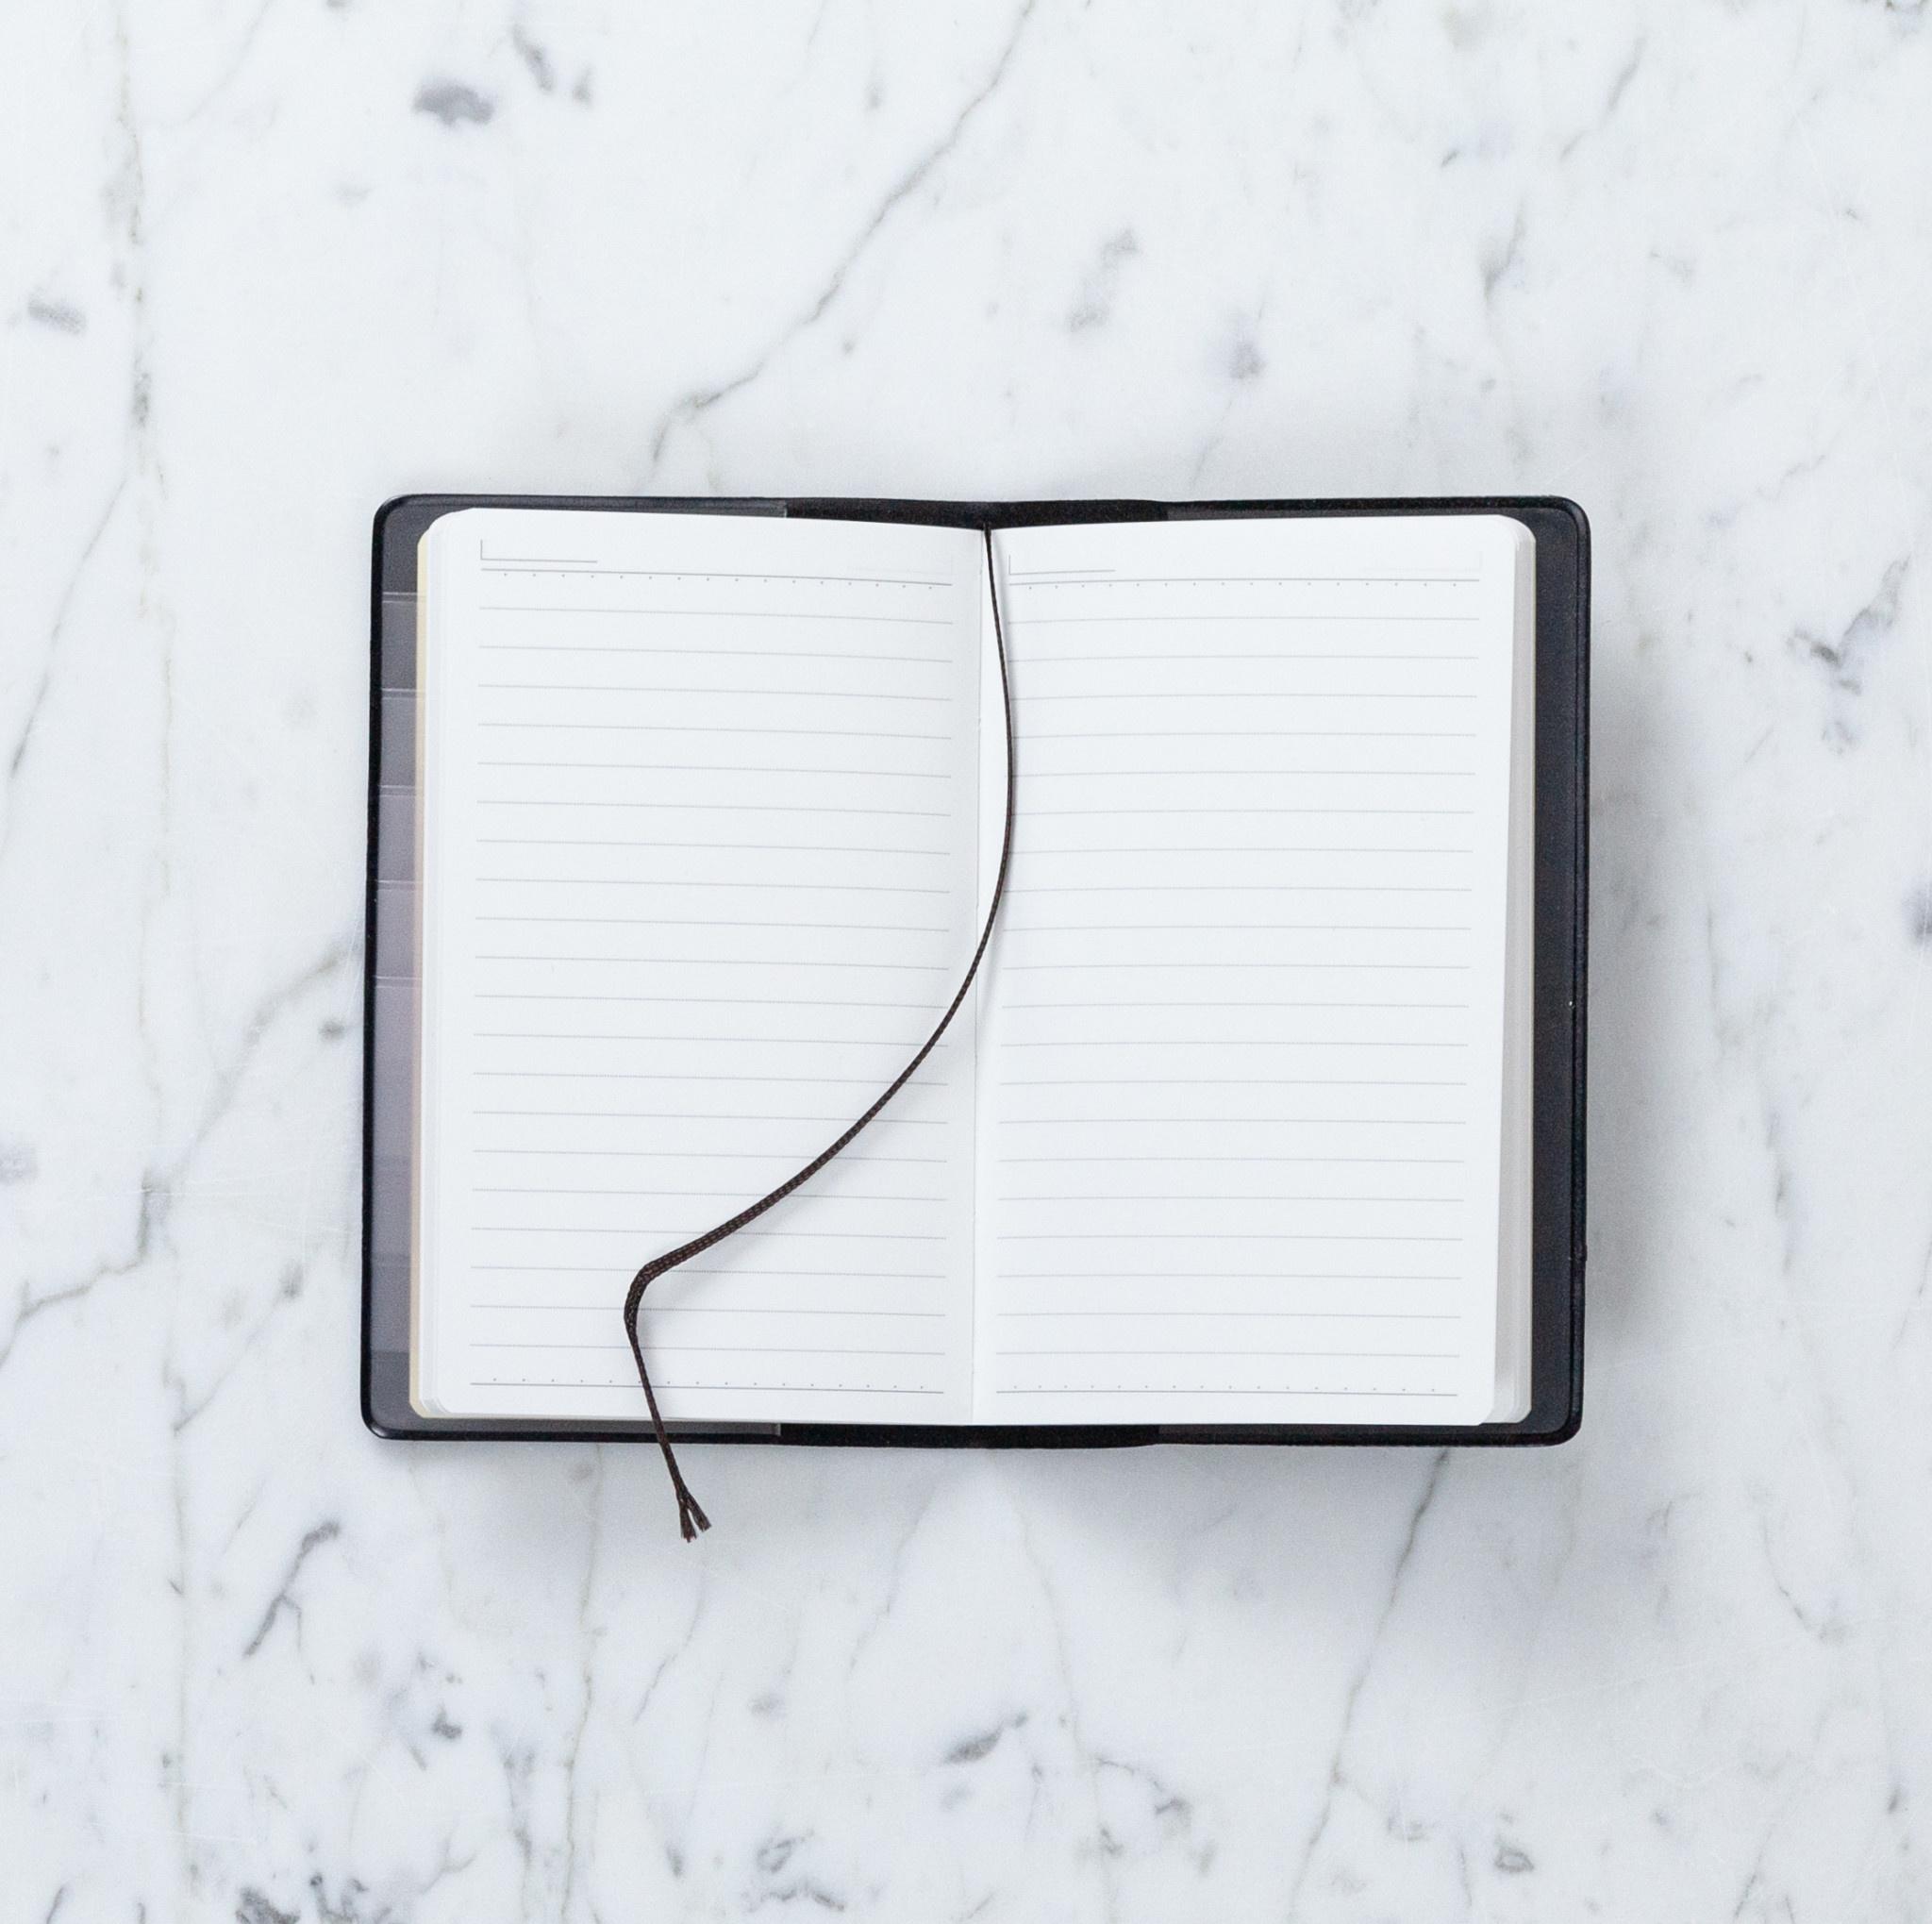 Black Memo Book - A6 - Ruled